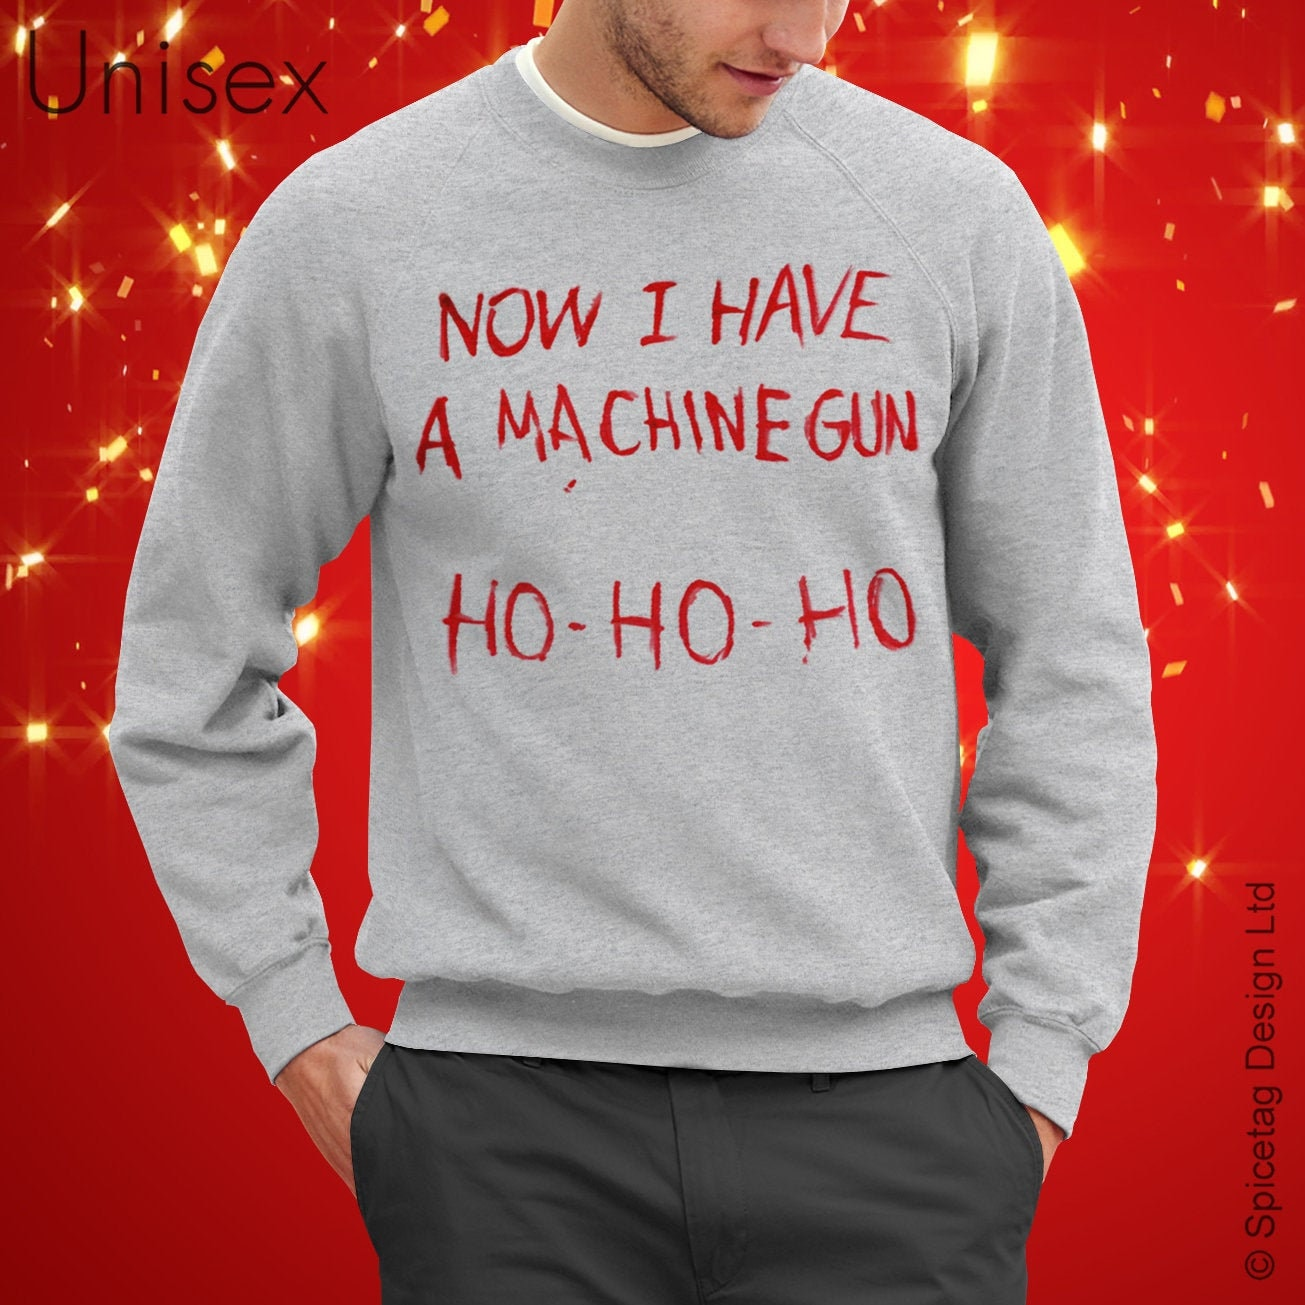 Now I Have A Machine Gun Sweater Movie Jumper Film Sweatshirt Fancy Dress Christmas Xmas Ho Heather Grey S XXL Halloween Costume Shirt